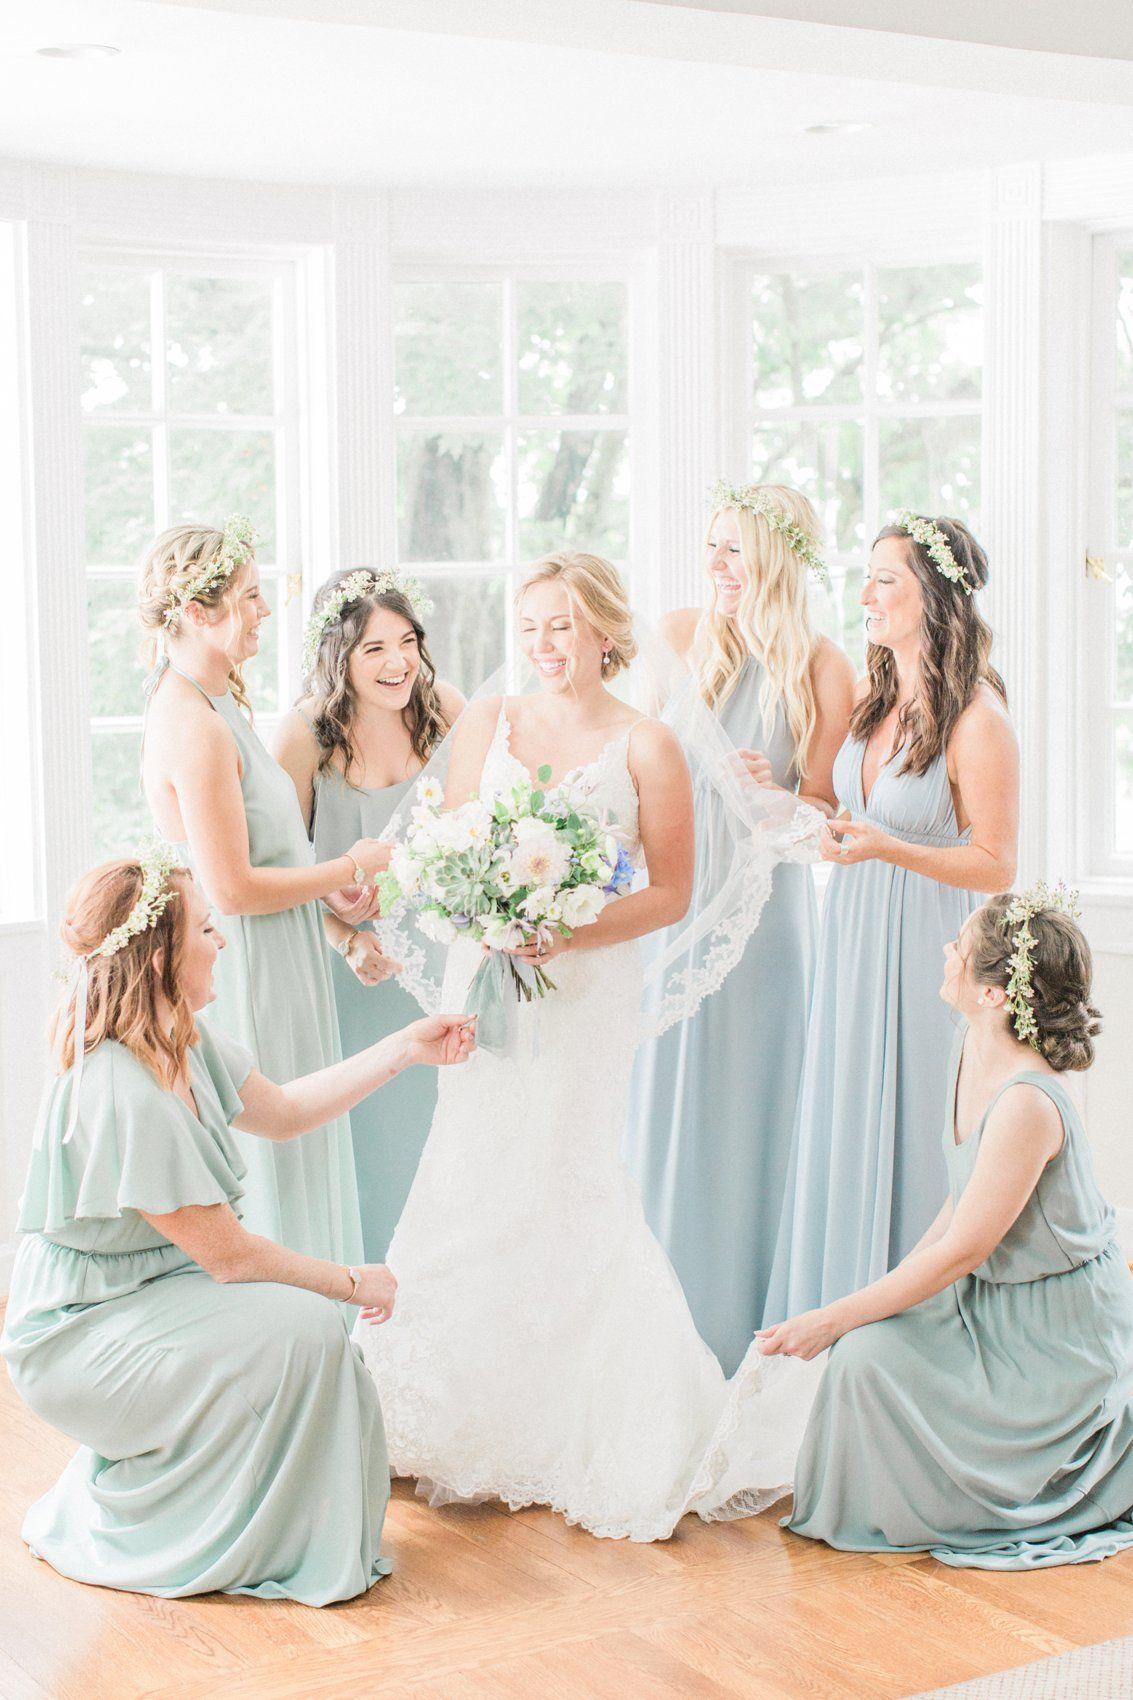 Pennsylvania fine art wedding photographer ashley errington